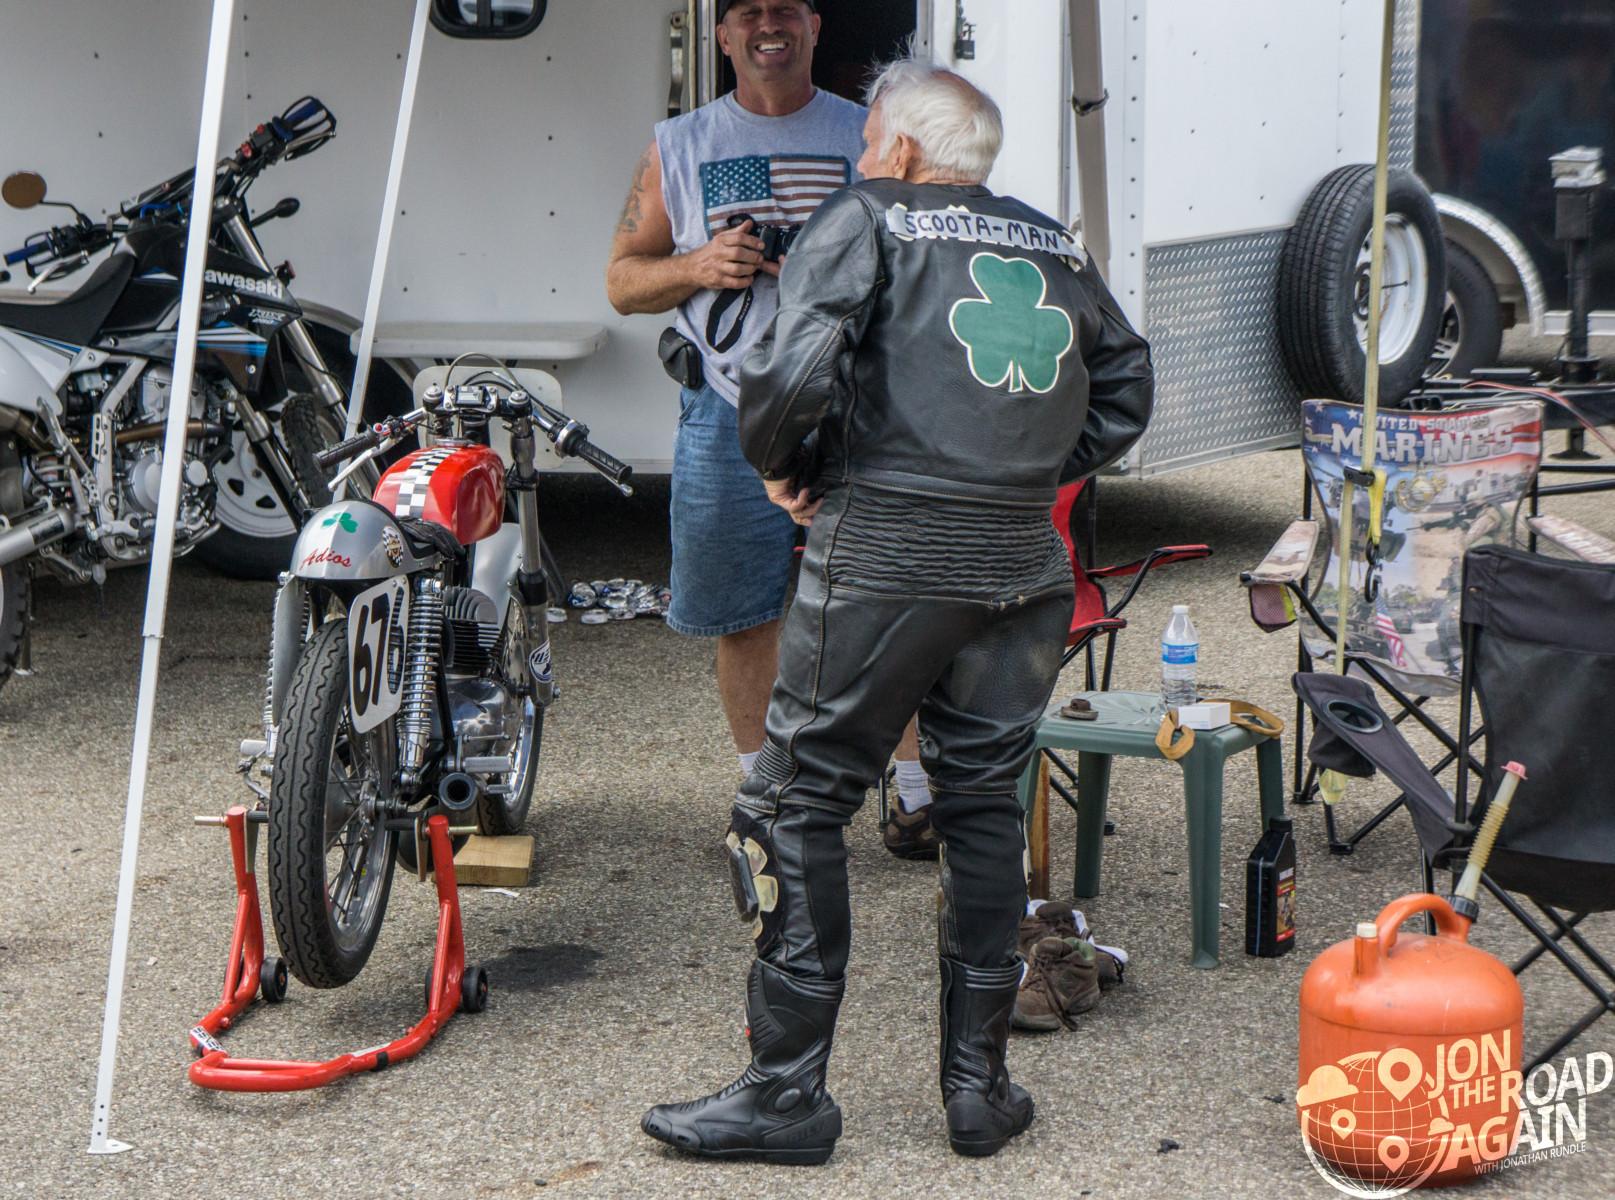 Scoota-man elderly motorcycle racer at AMA Vintage Motorcycle Days